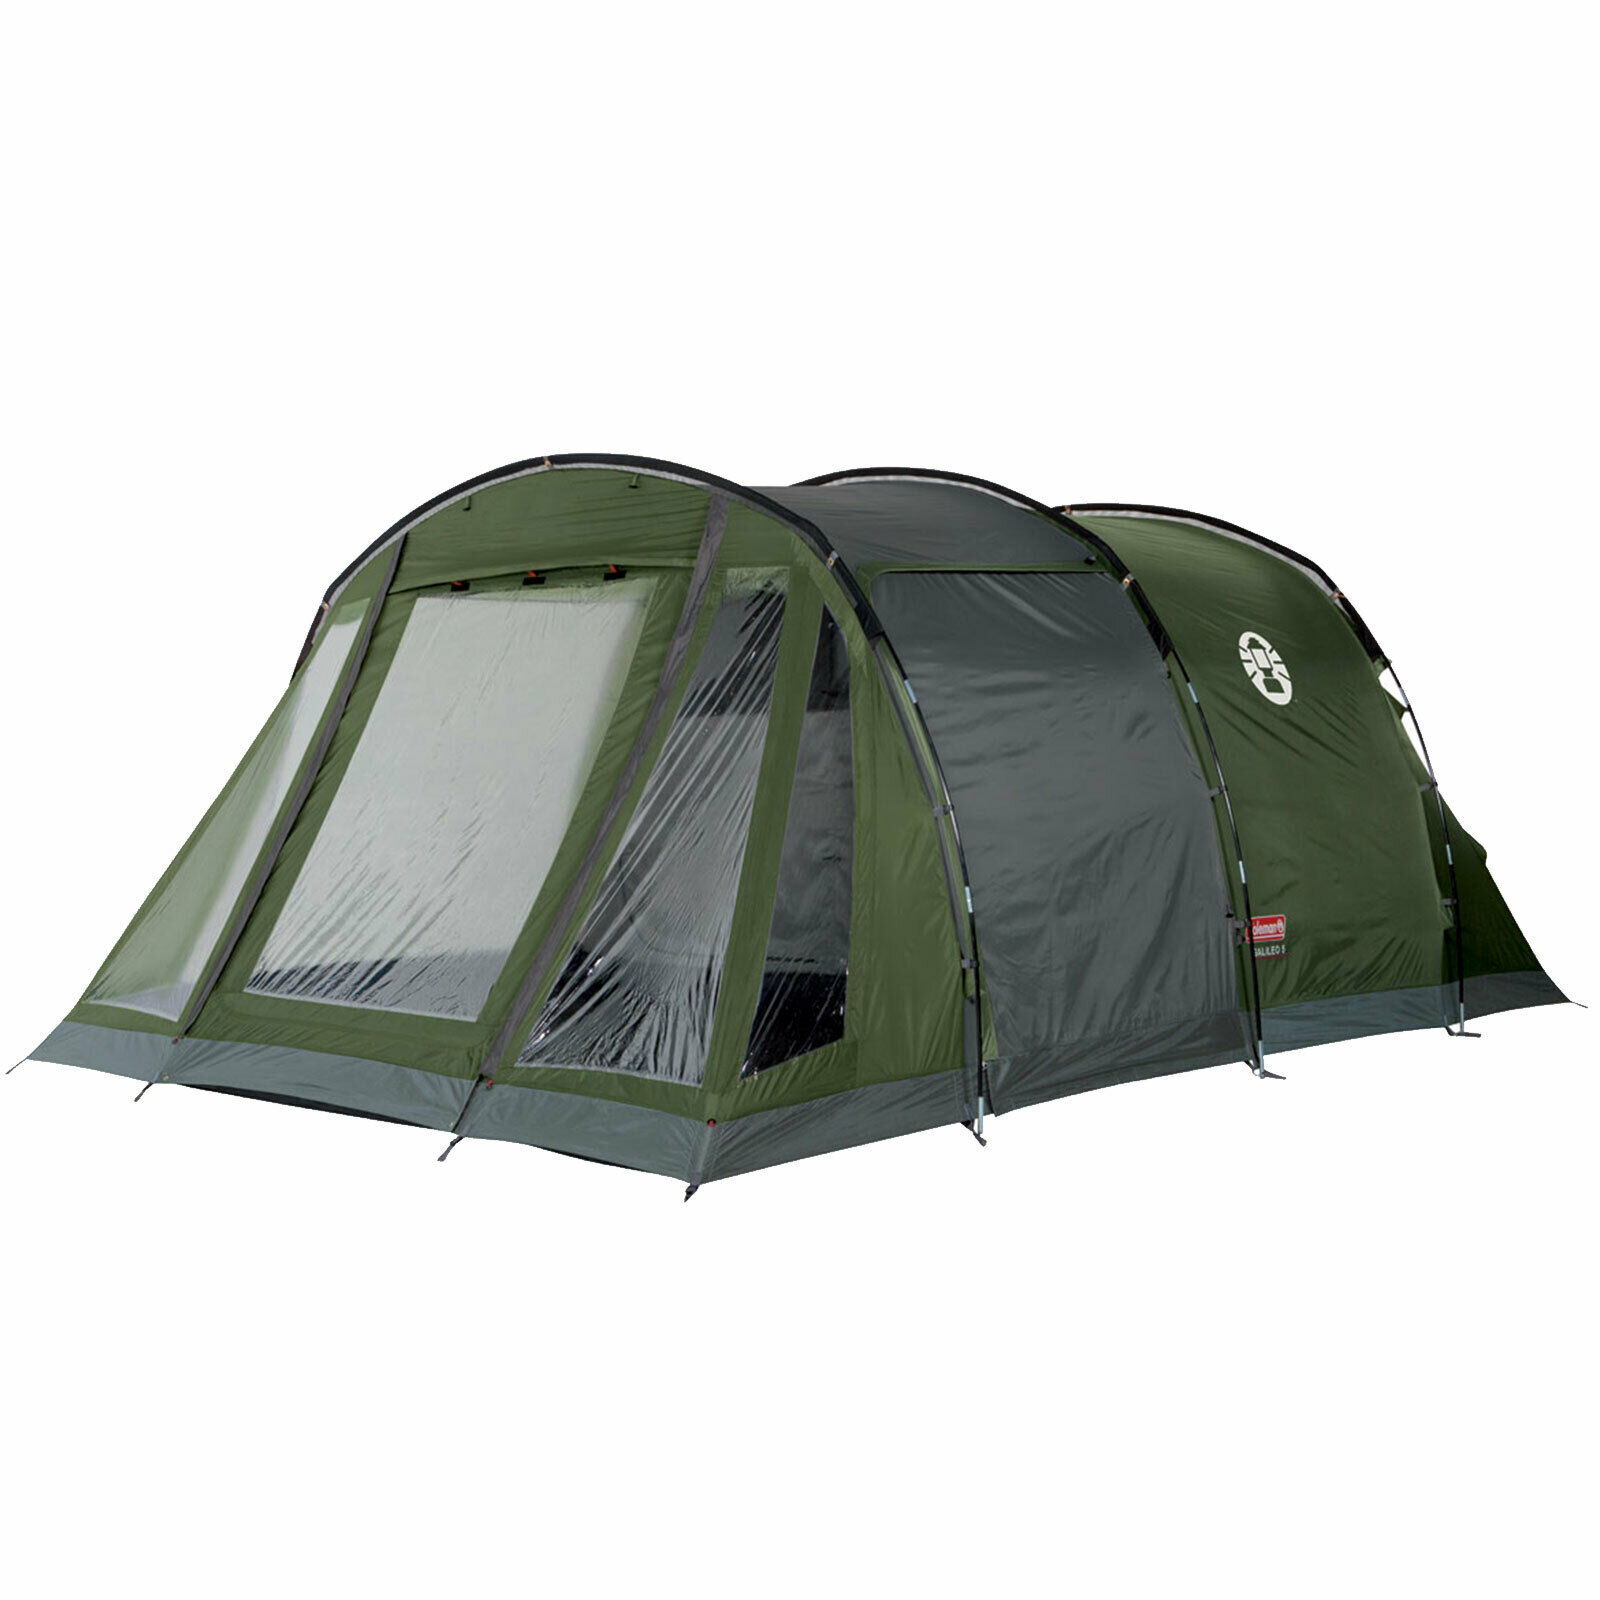 Coleman Galileo Tent 5 Personen Zelt Campingzelt Familienzelt Tunnelzelt Grün